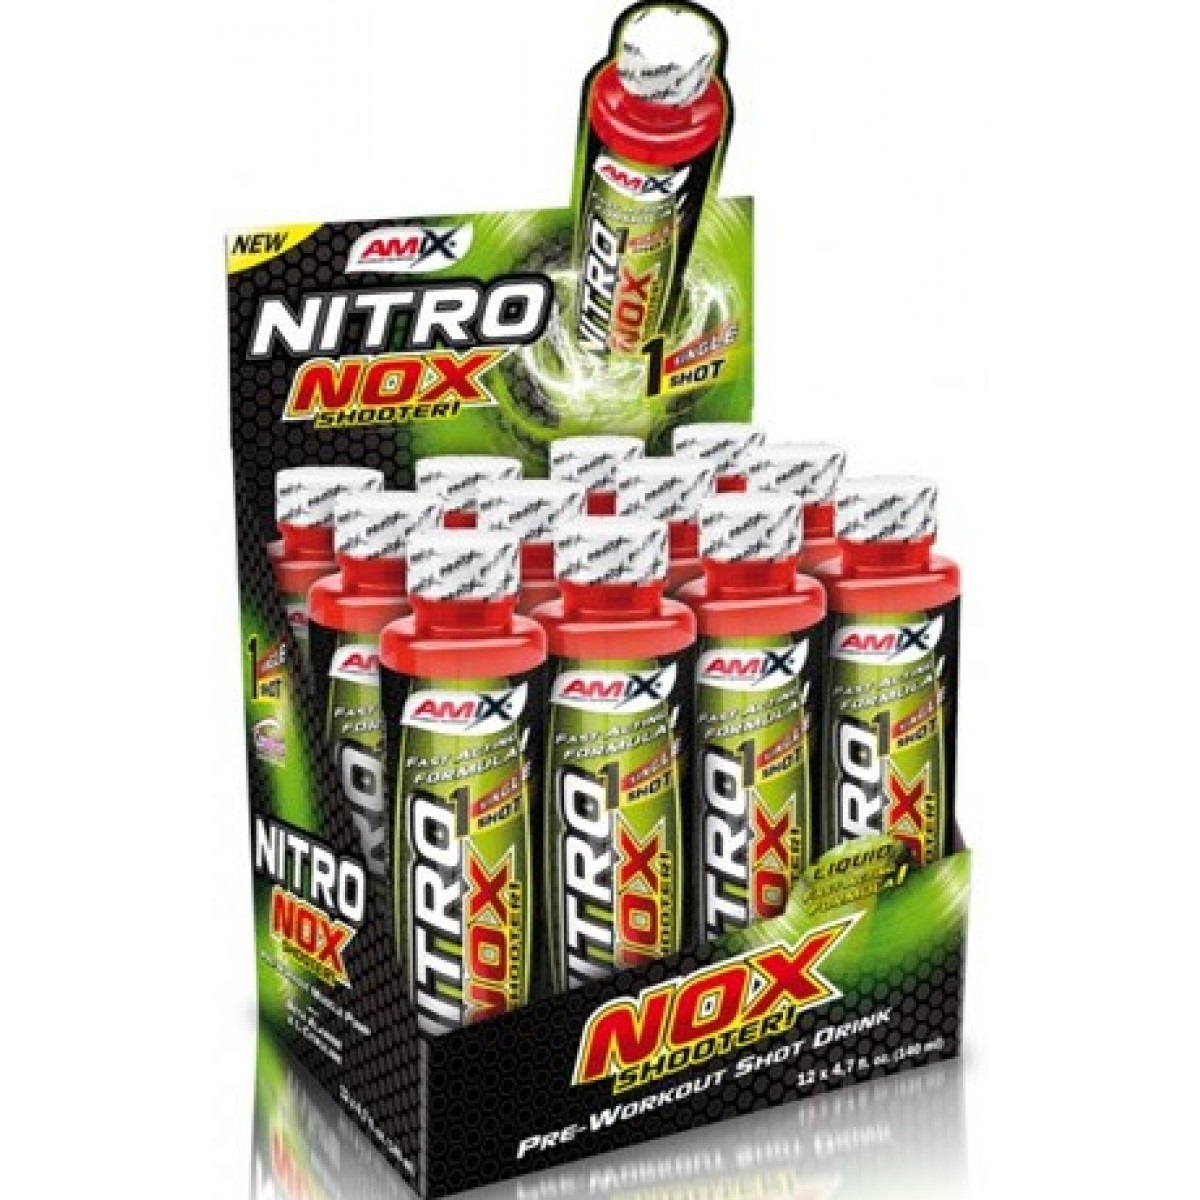 AMIX Nitronox Shooter 140 мл  12 ампули